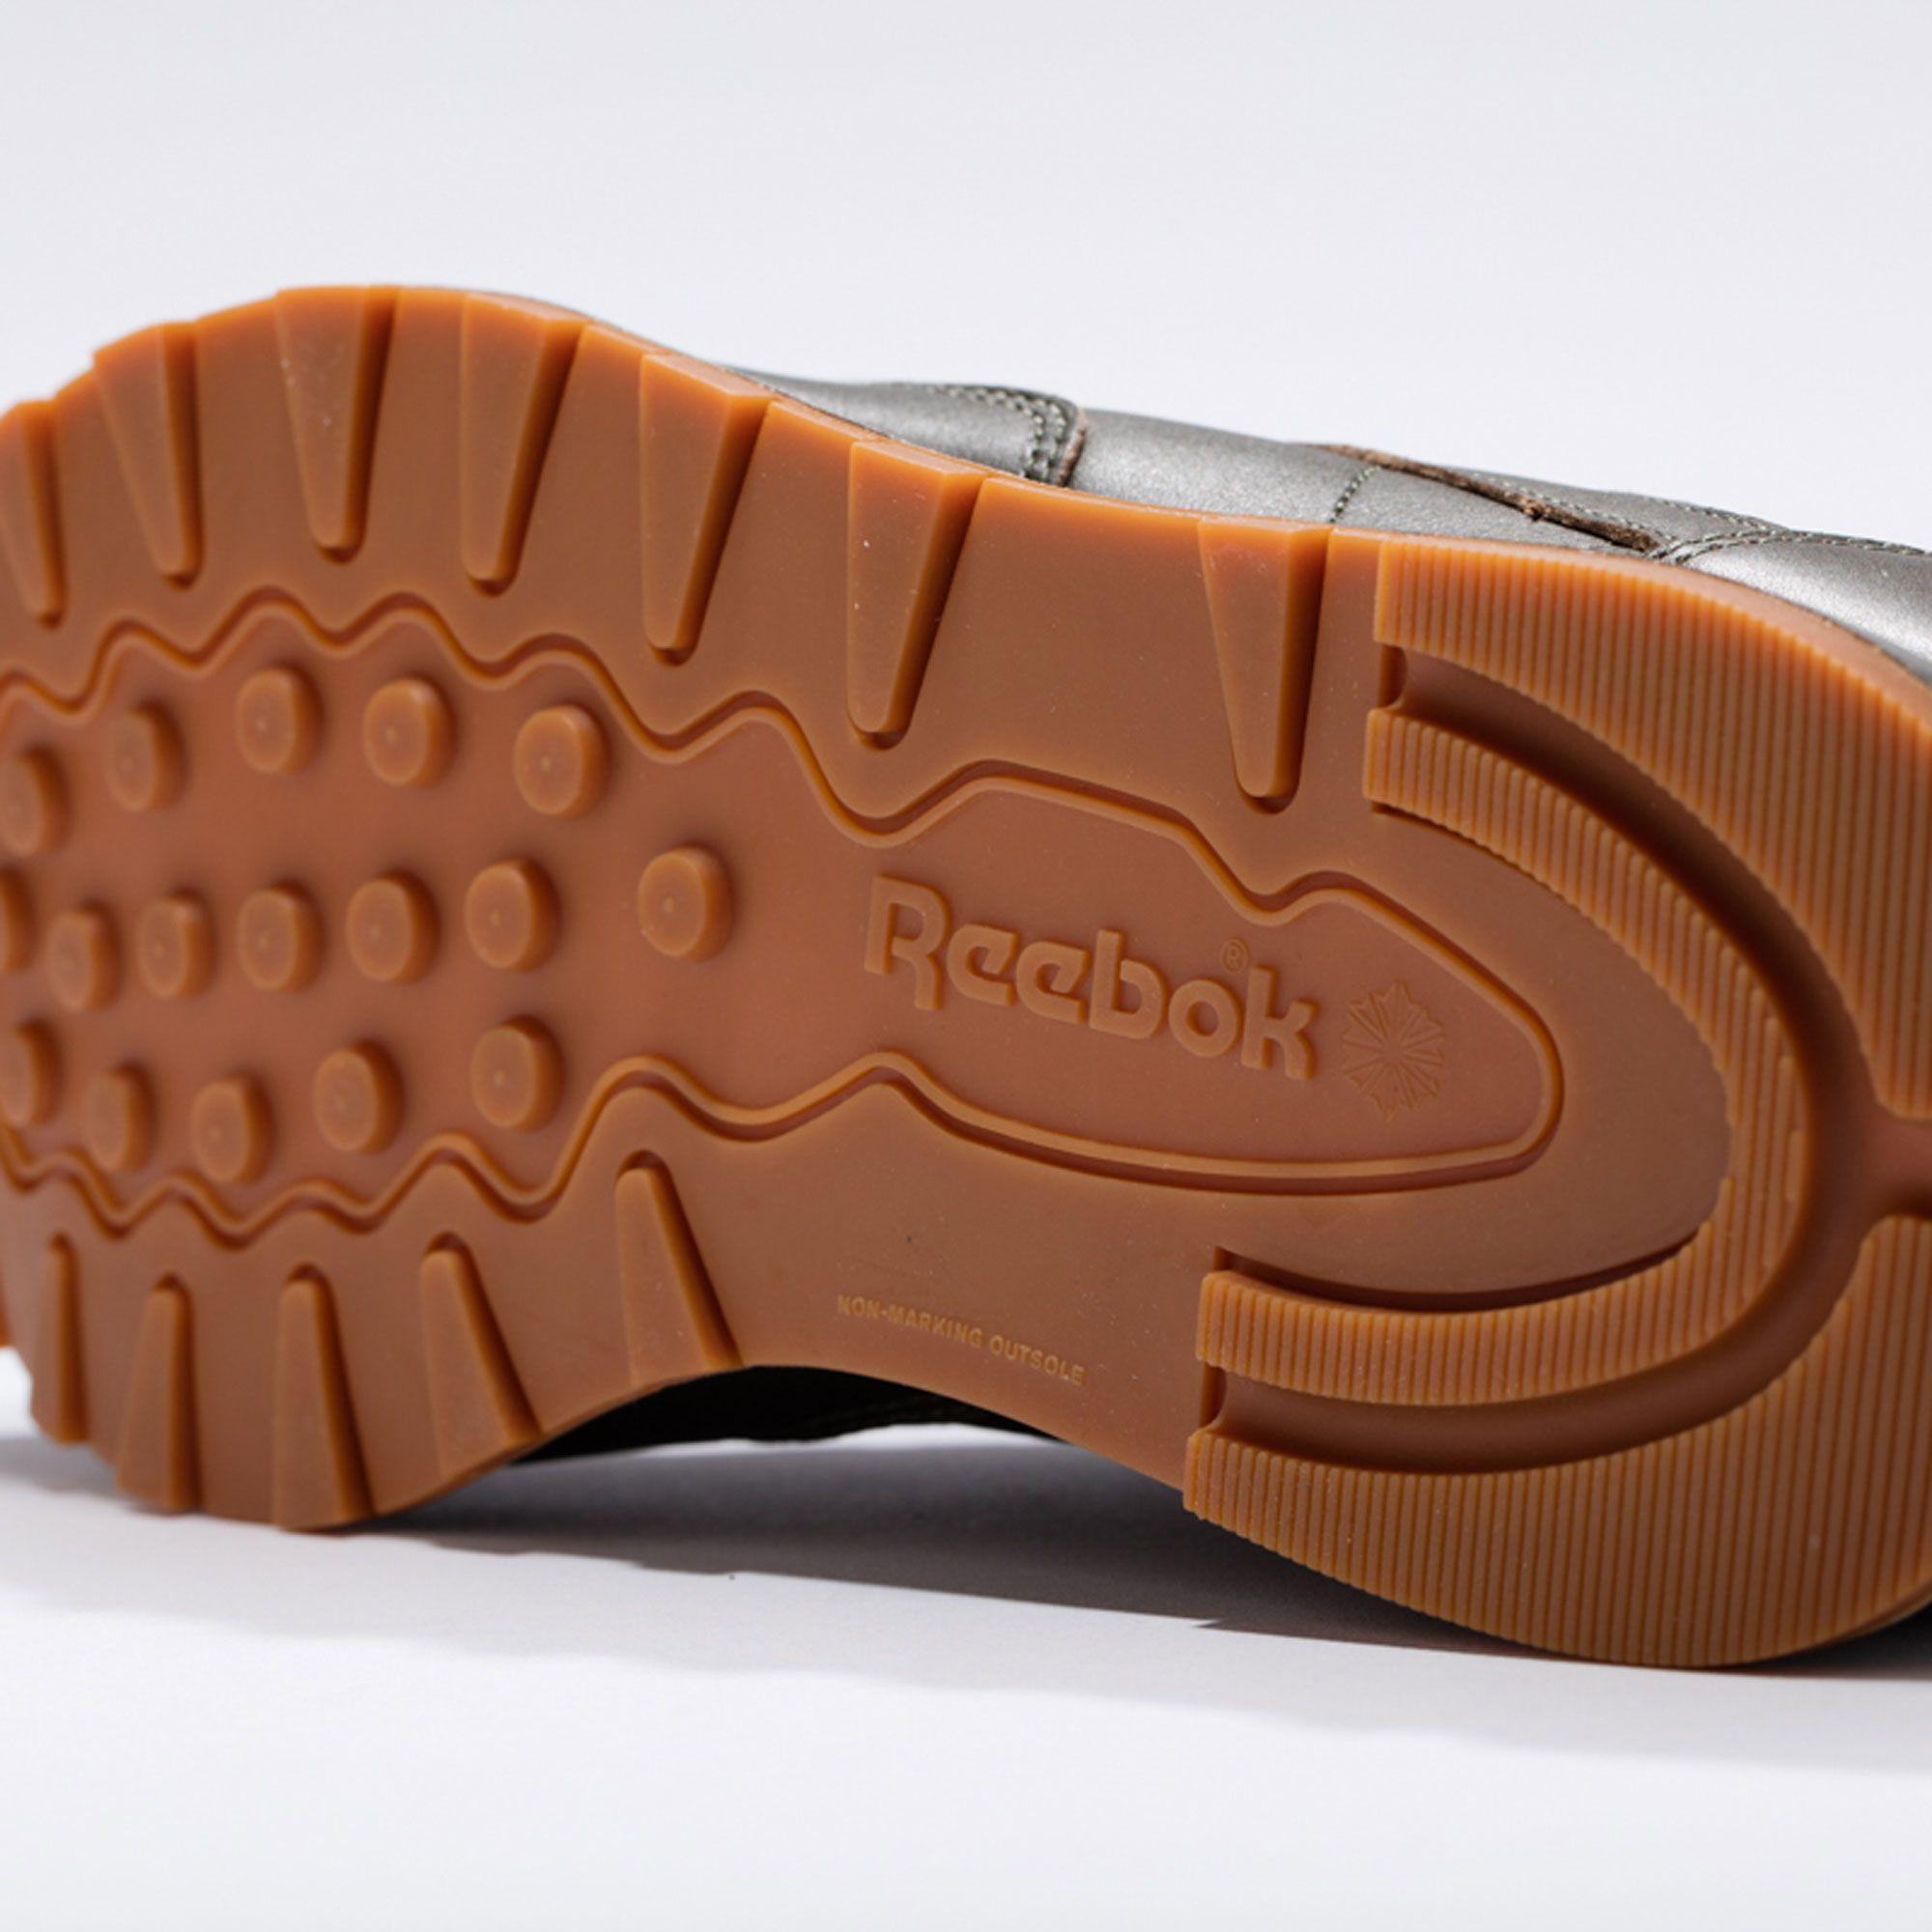 kendrick-lamar-x-reebok-leather-lux-bs7465-3